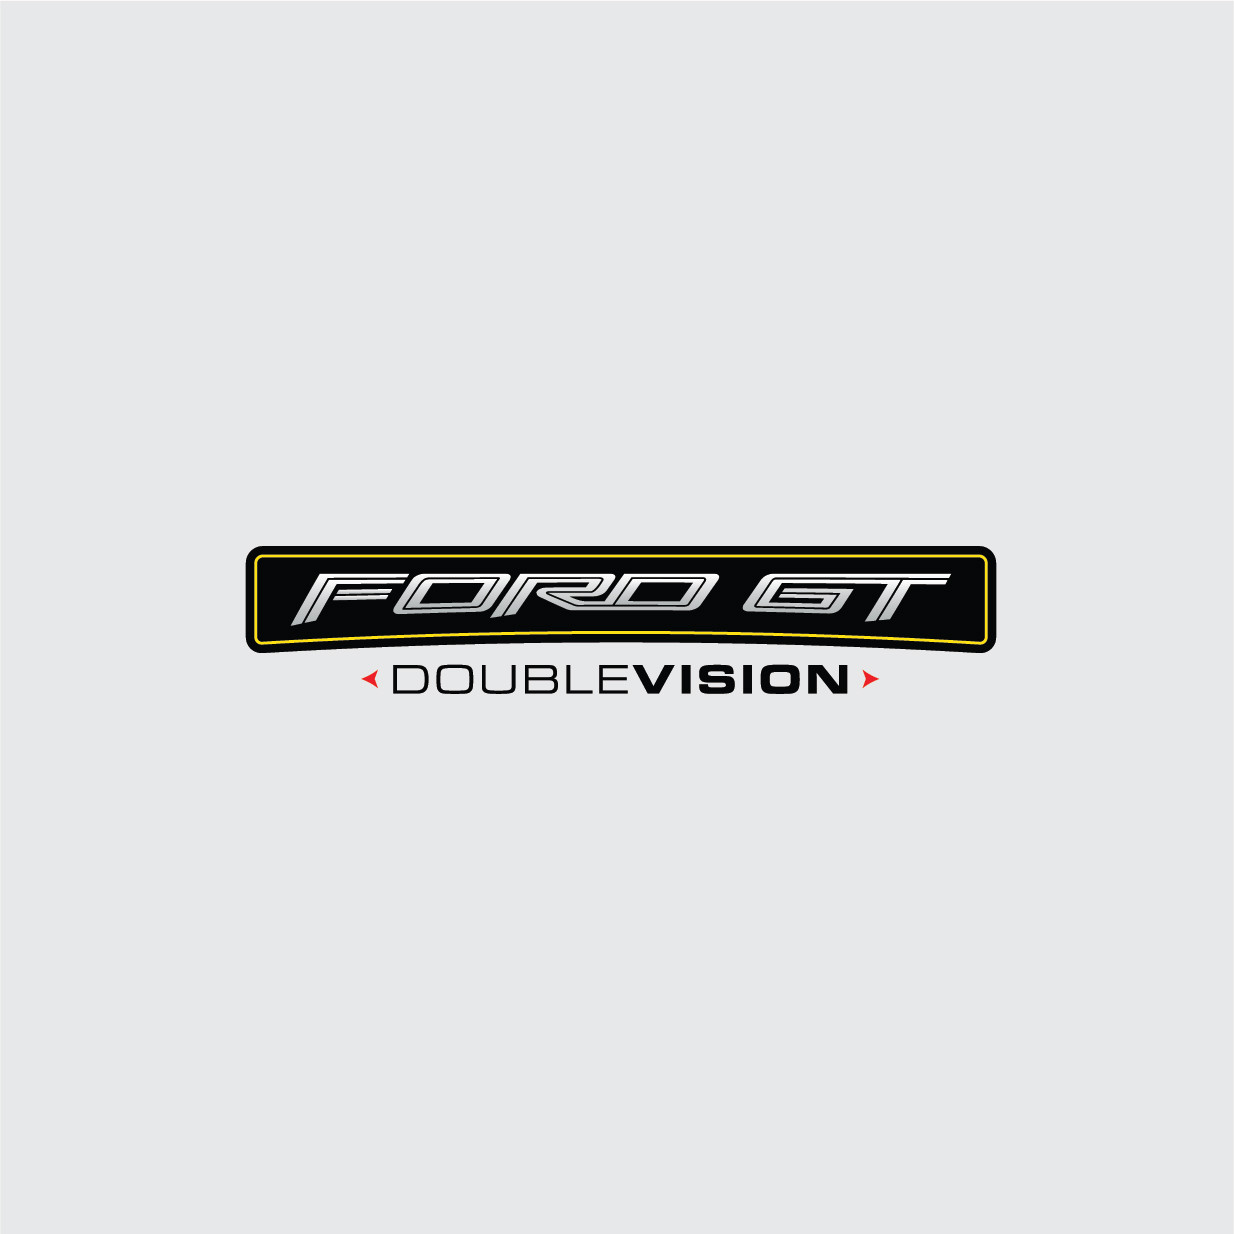 FordGT-DblVision - Logo.jpg